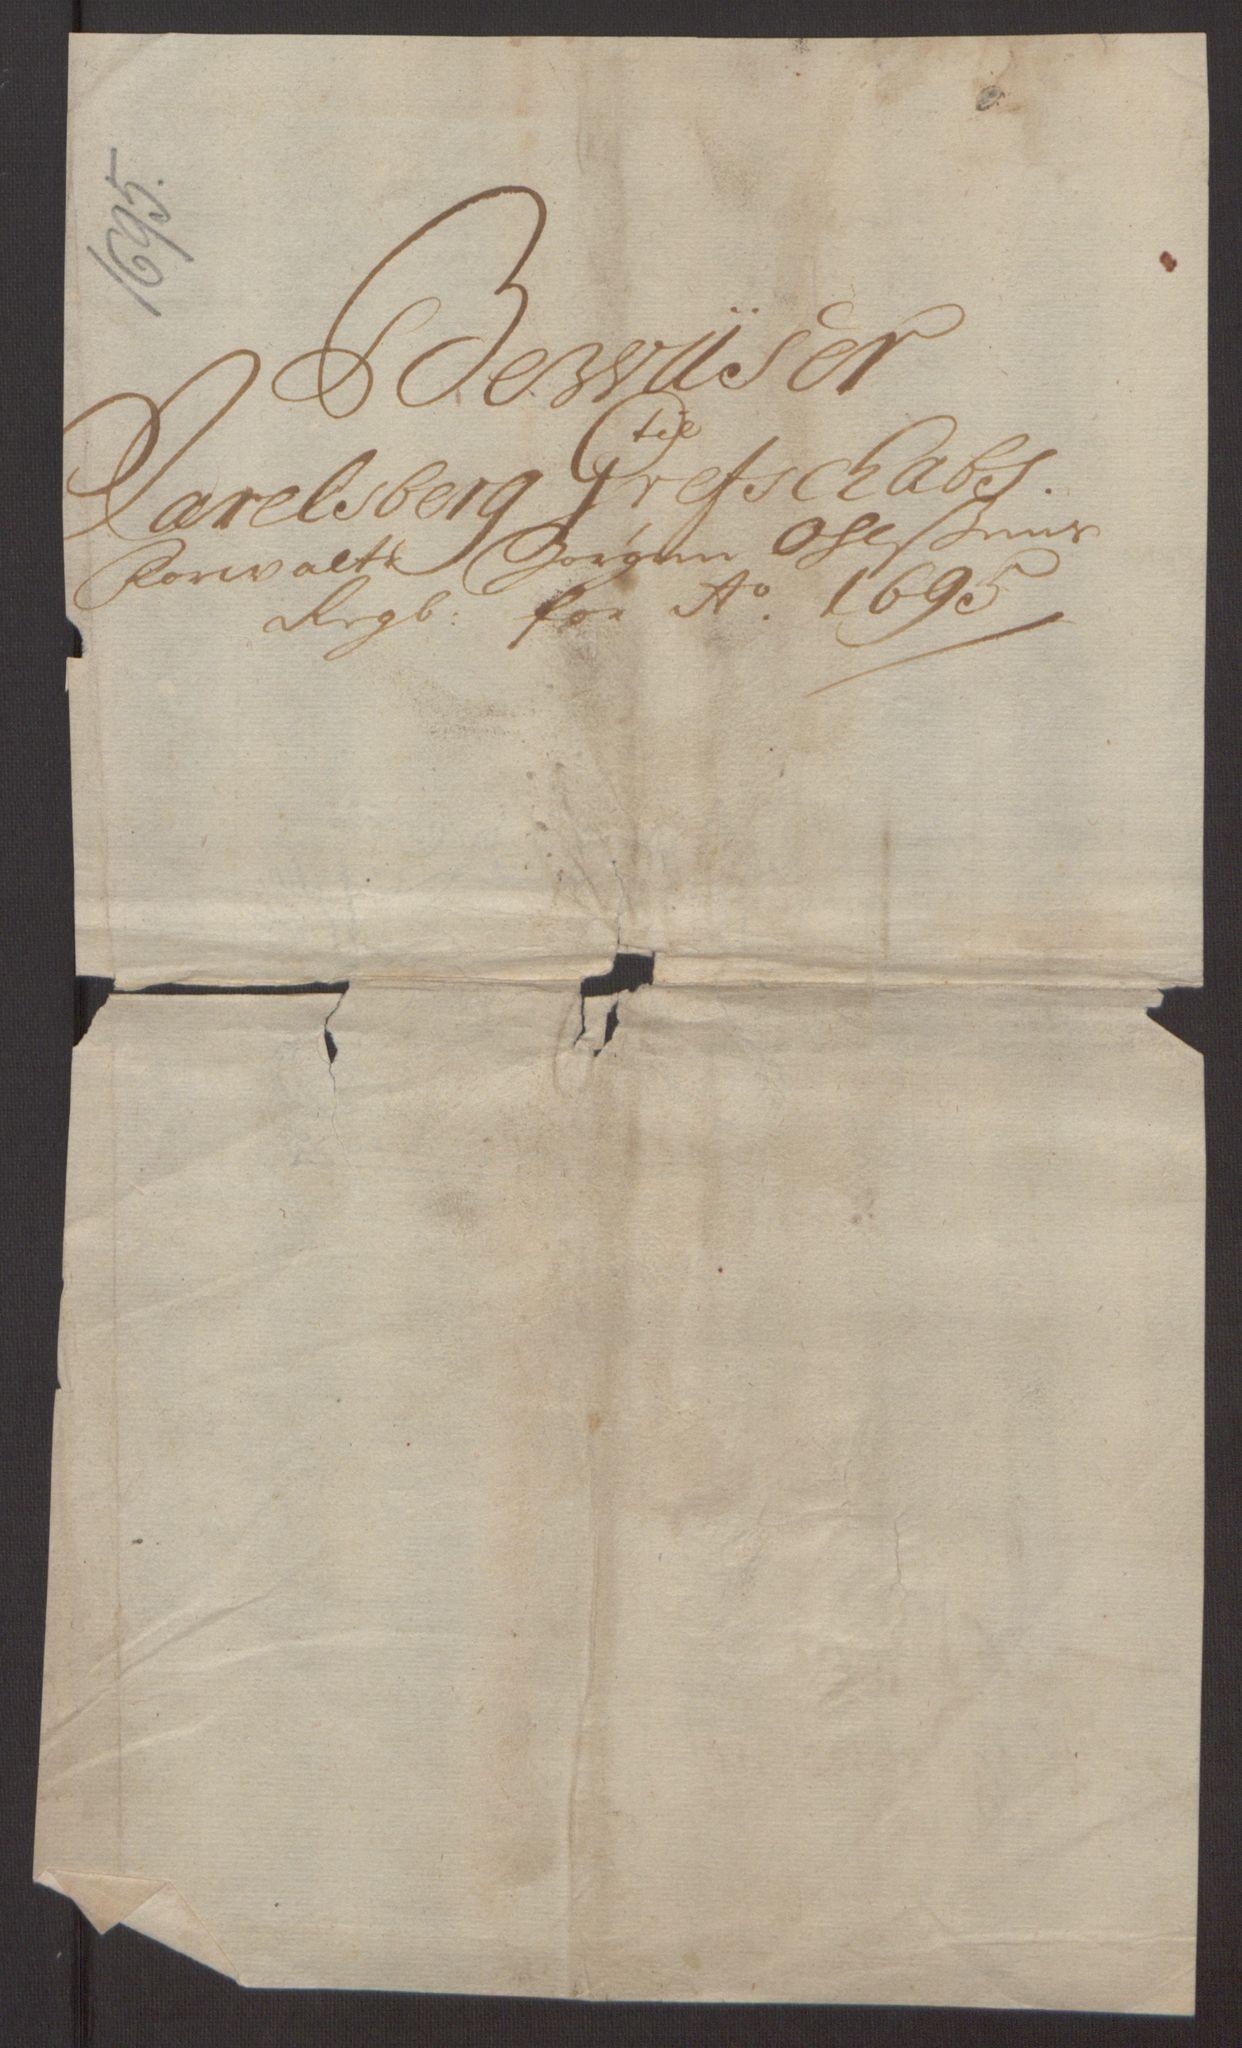 RA, Rentekammeret inntil 1814, Reviderte regnskaper, Fogderegnskap, R32/L1867: Fogderegnskap Jarlsberg grevskap, 1694-1696, s. 195